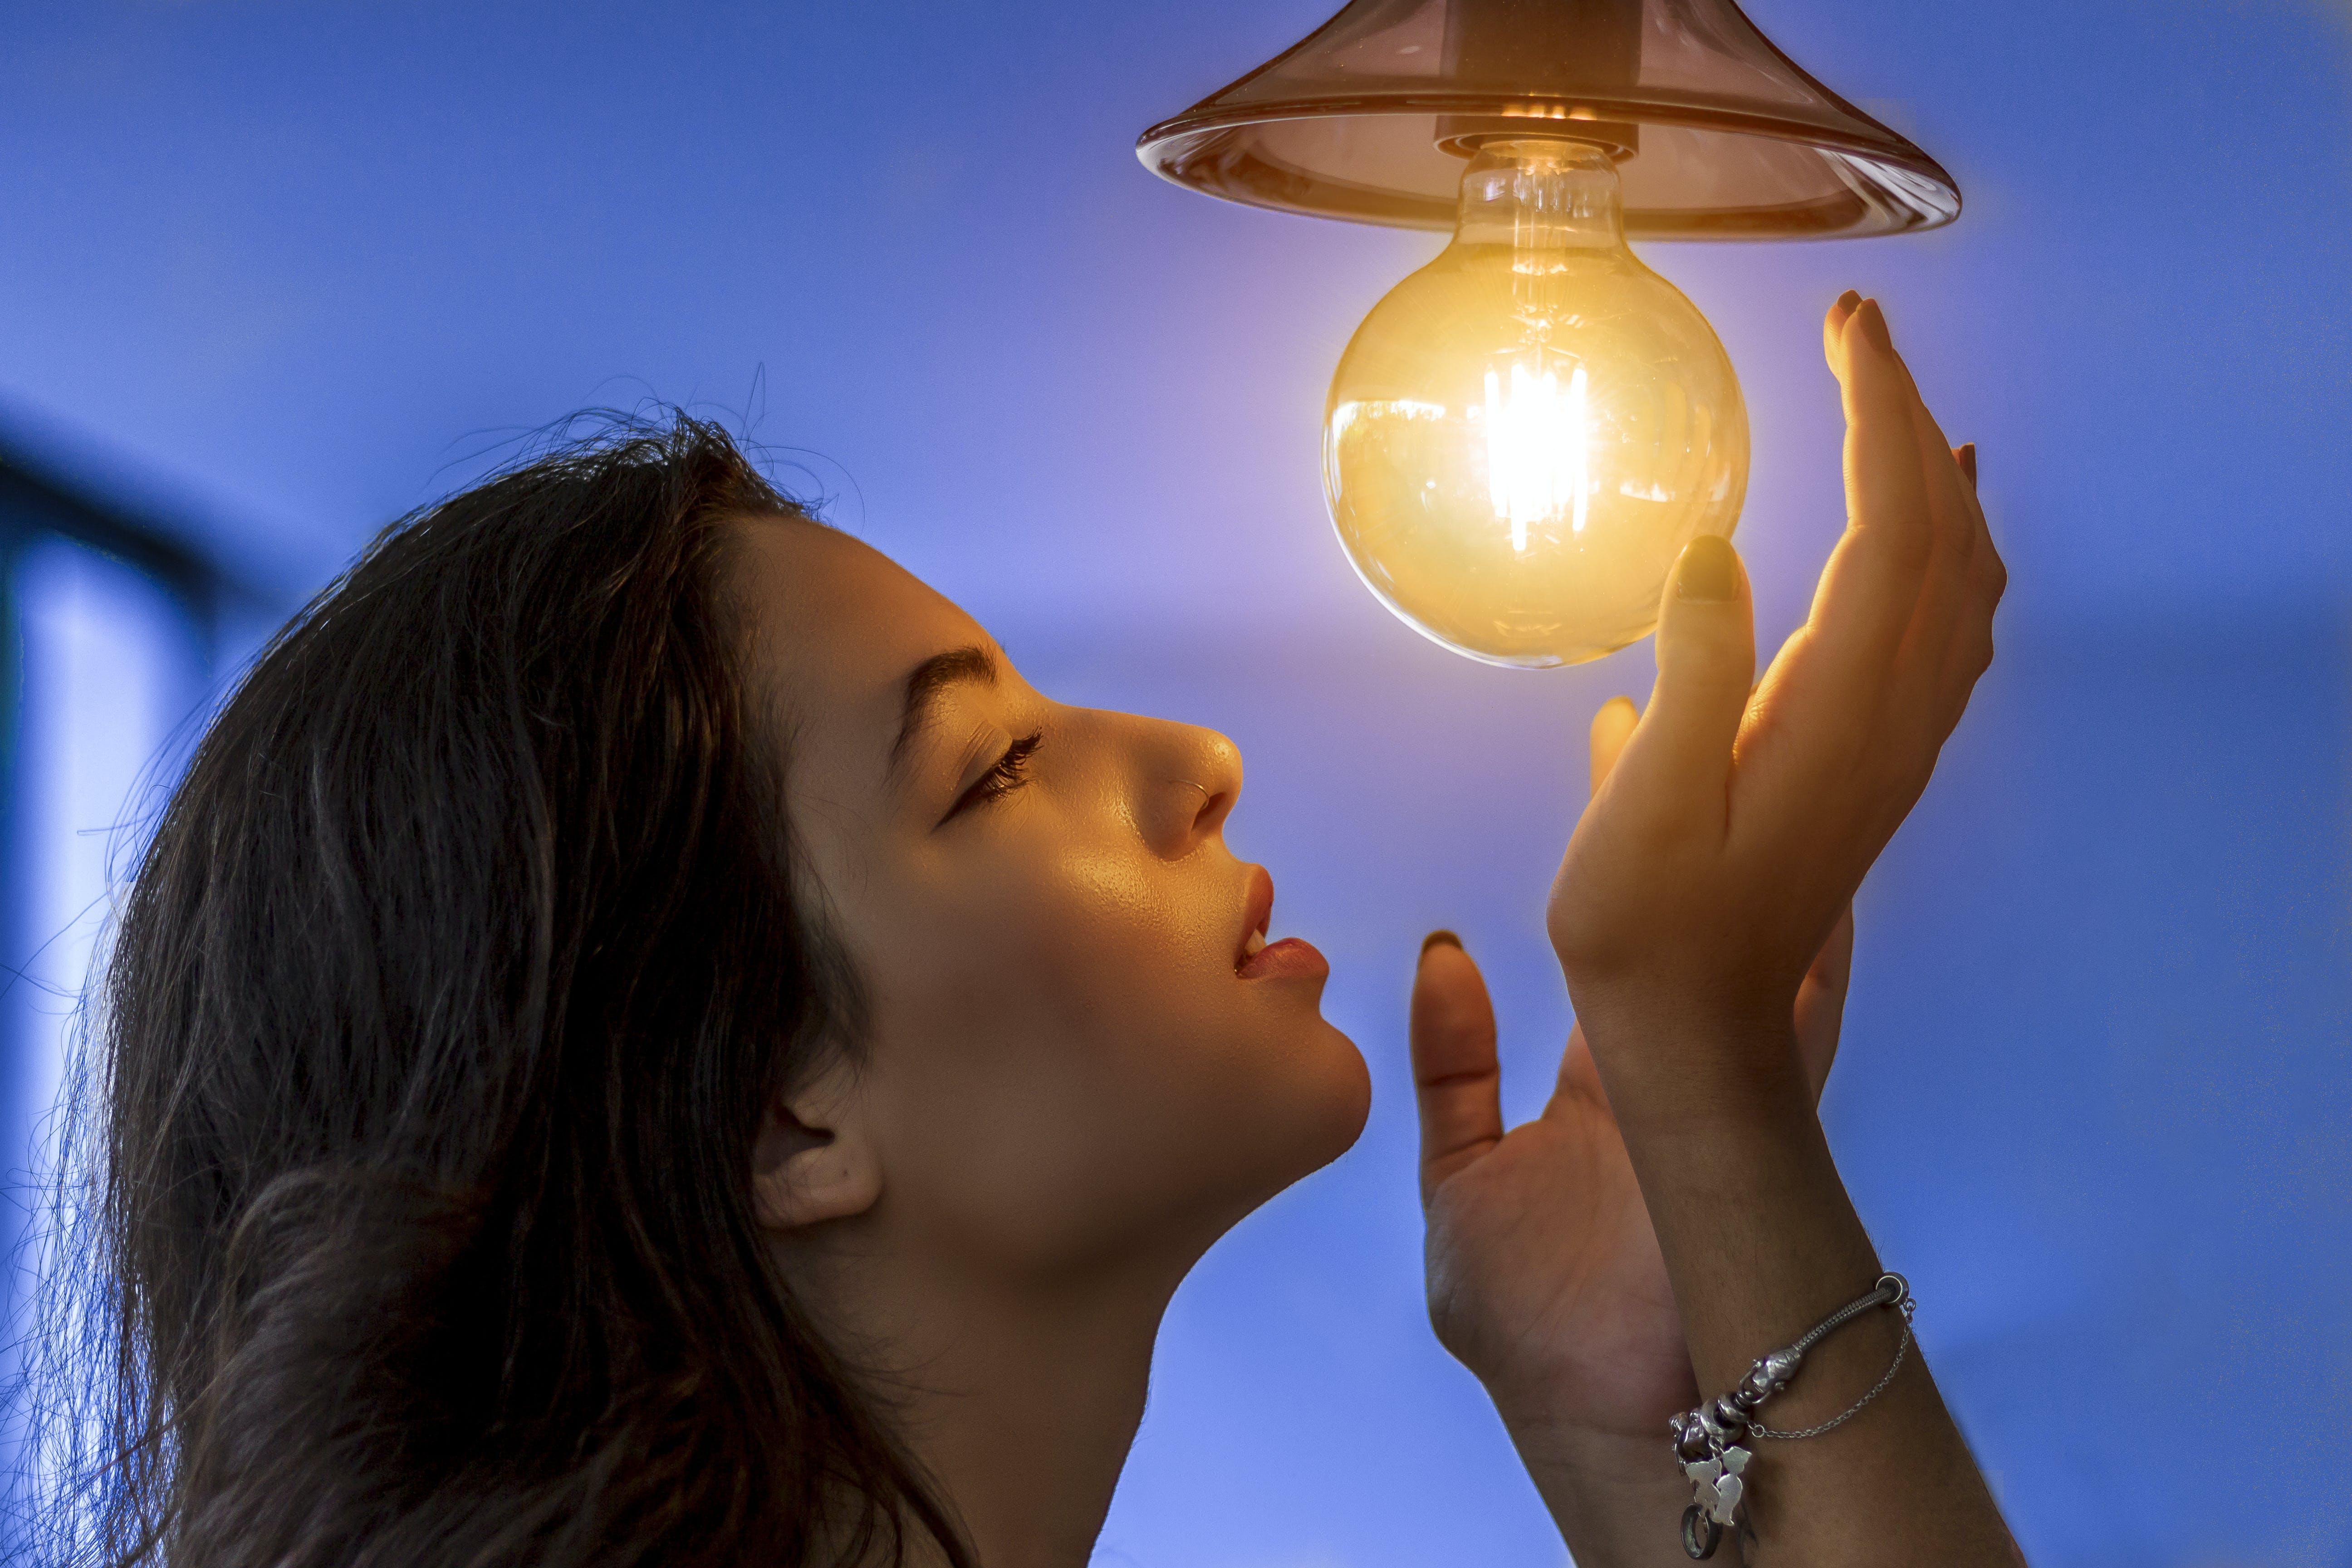 Woman Near Turned-on Light Bulb